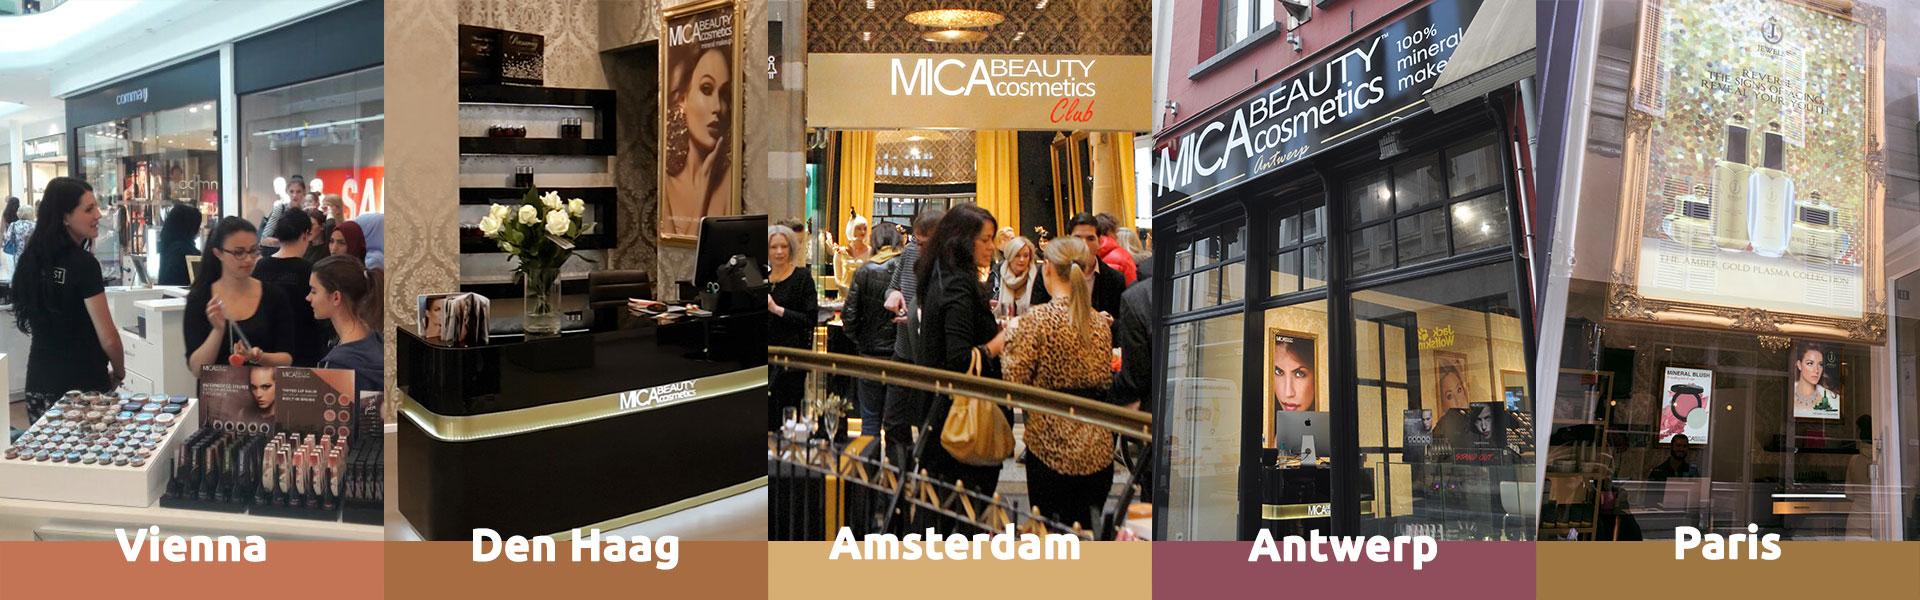 MICAbeauty Shops Across Europe